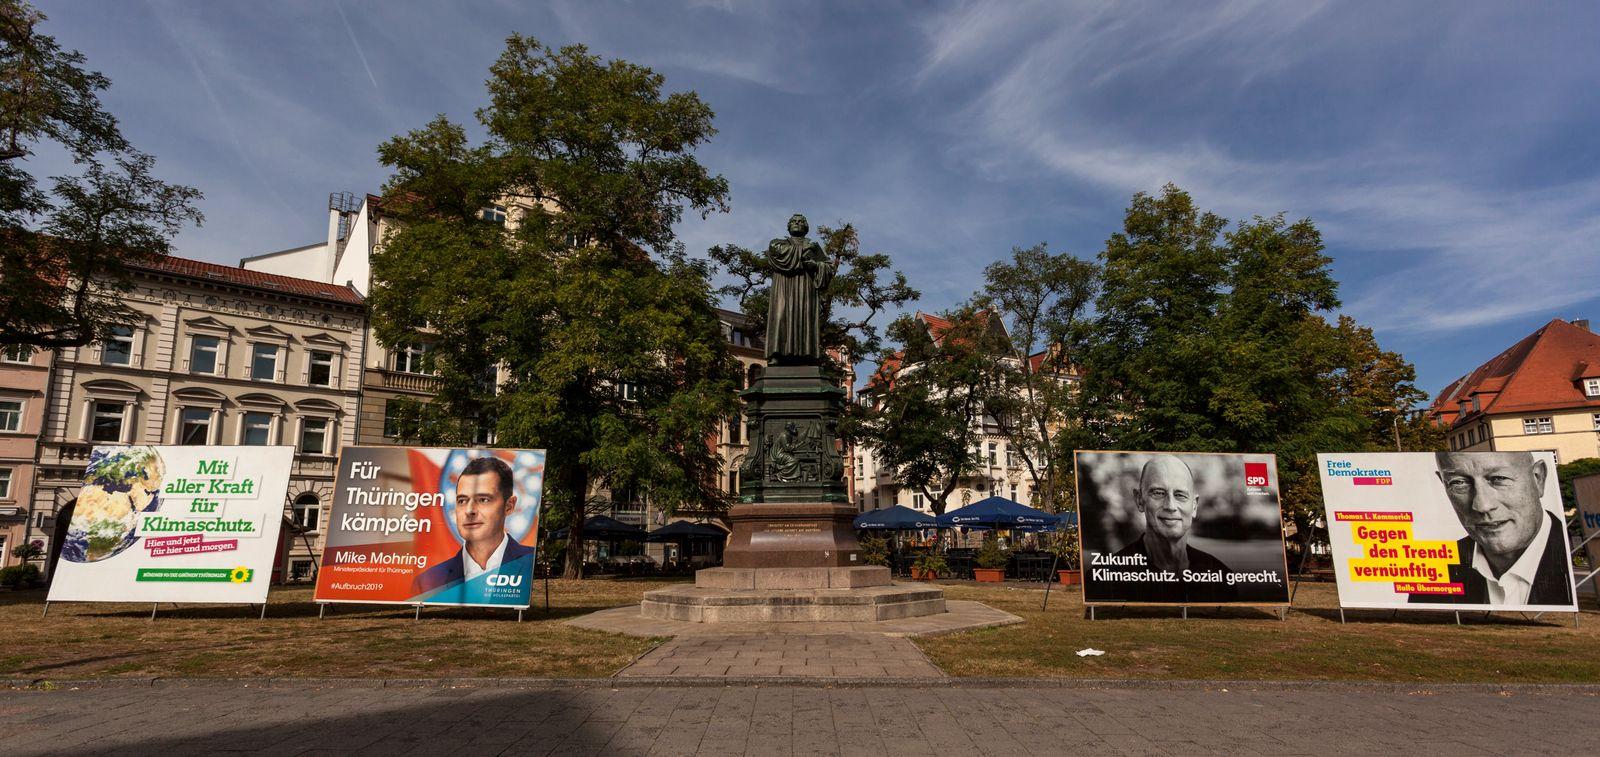 EINMALIGE VERWENDUNG Thüringen 2019/ Wahlkampf/ Plakate